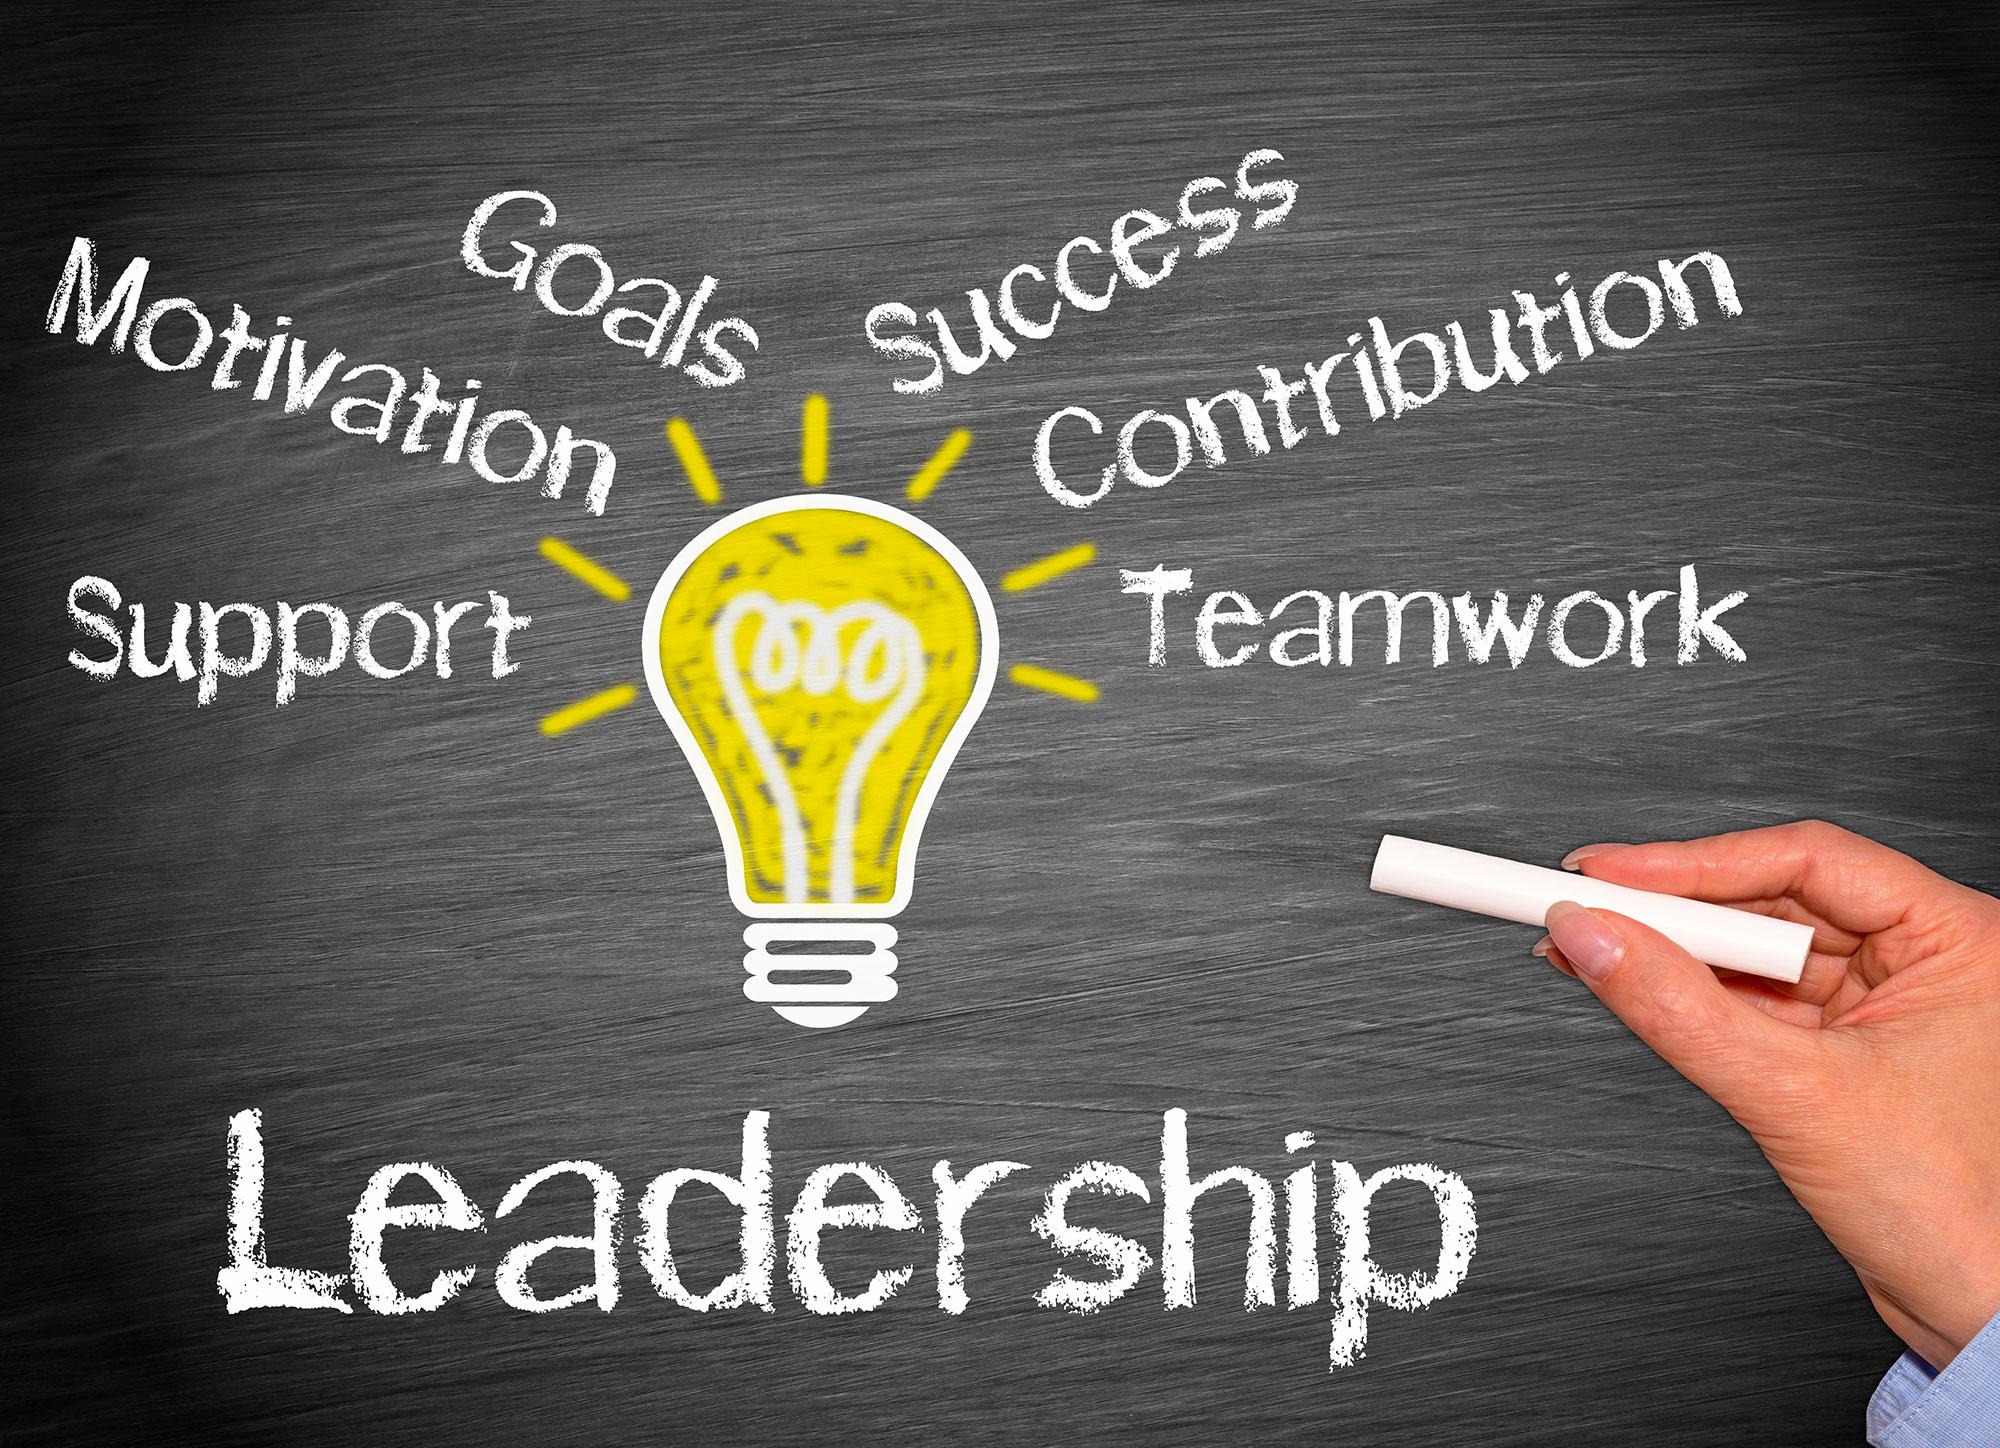 shutterstock_161872157-staff-and-leadership-dvlpmt1.jpg